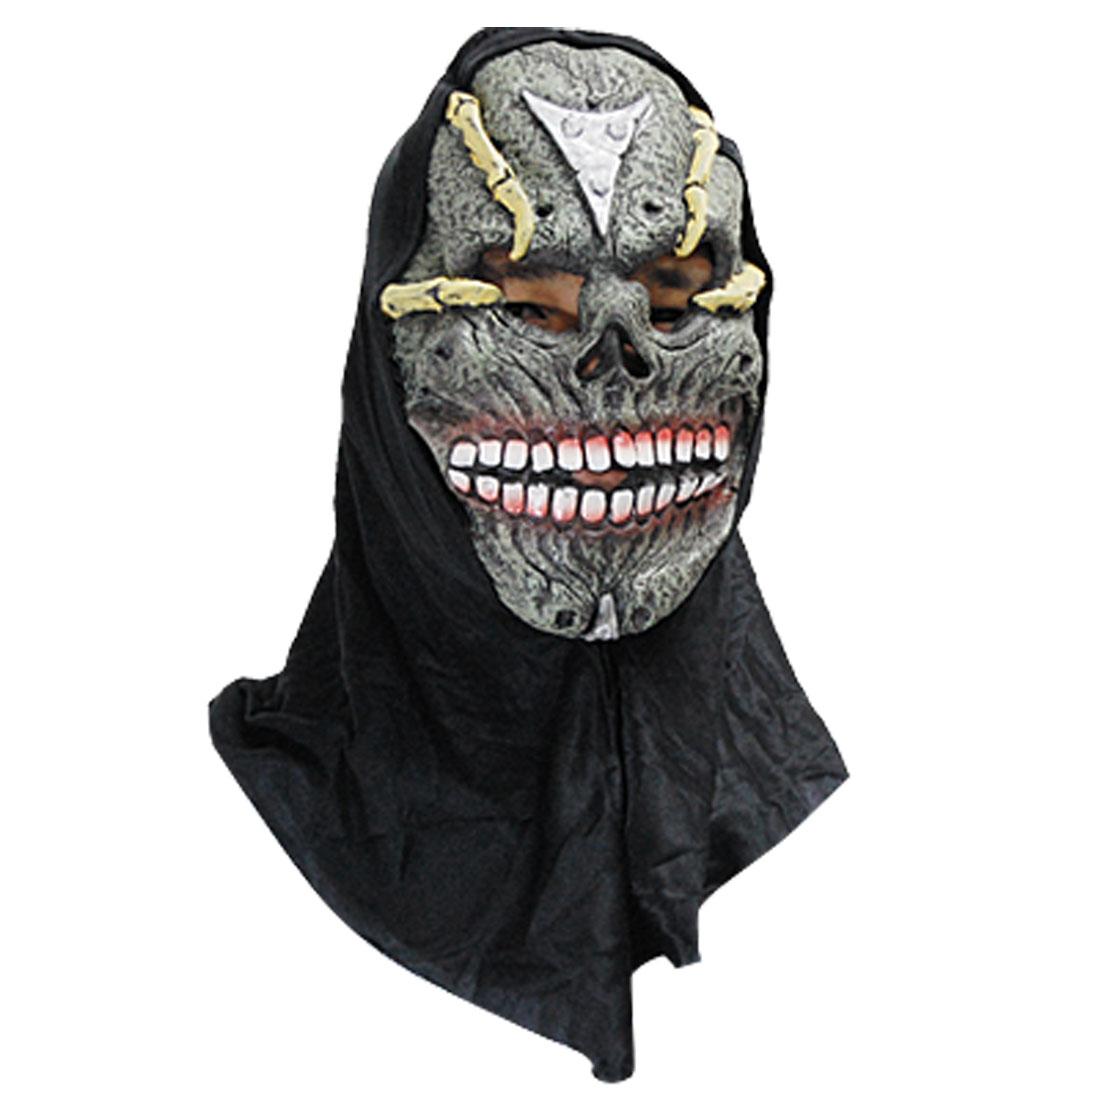 Dead Pawn Skull Rubber Halloween Mask